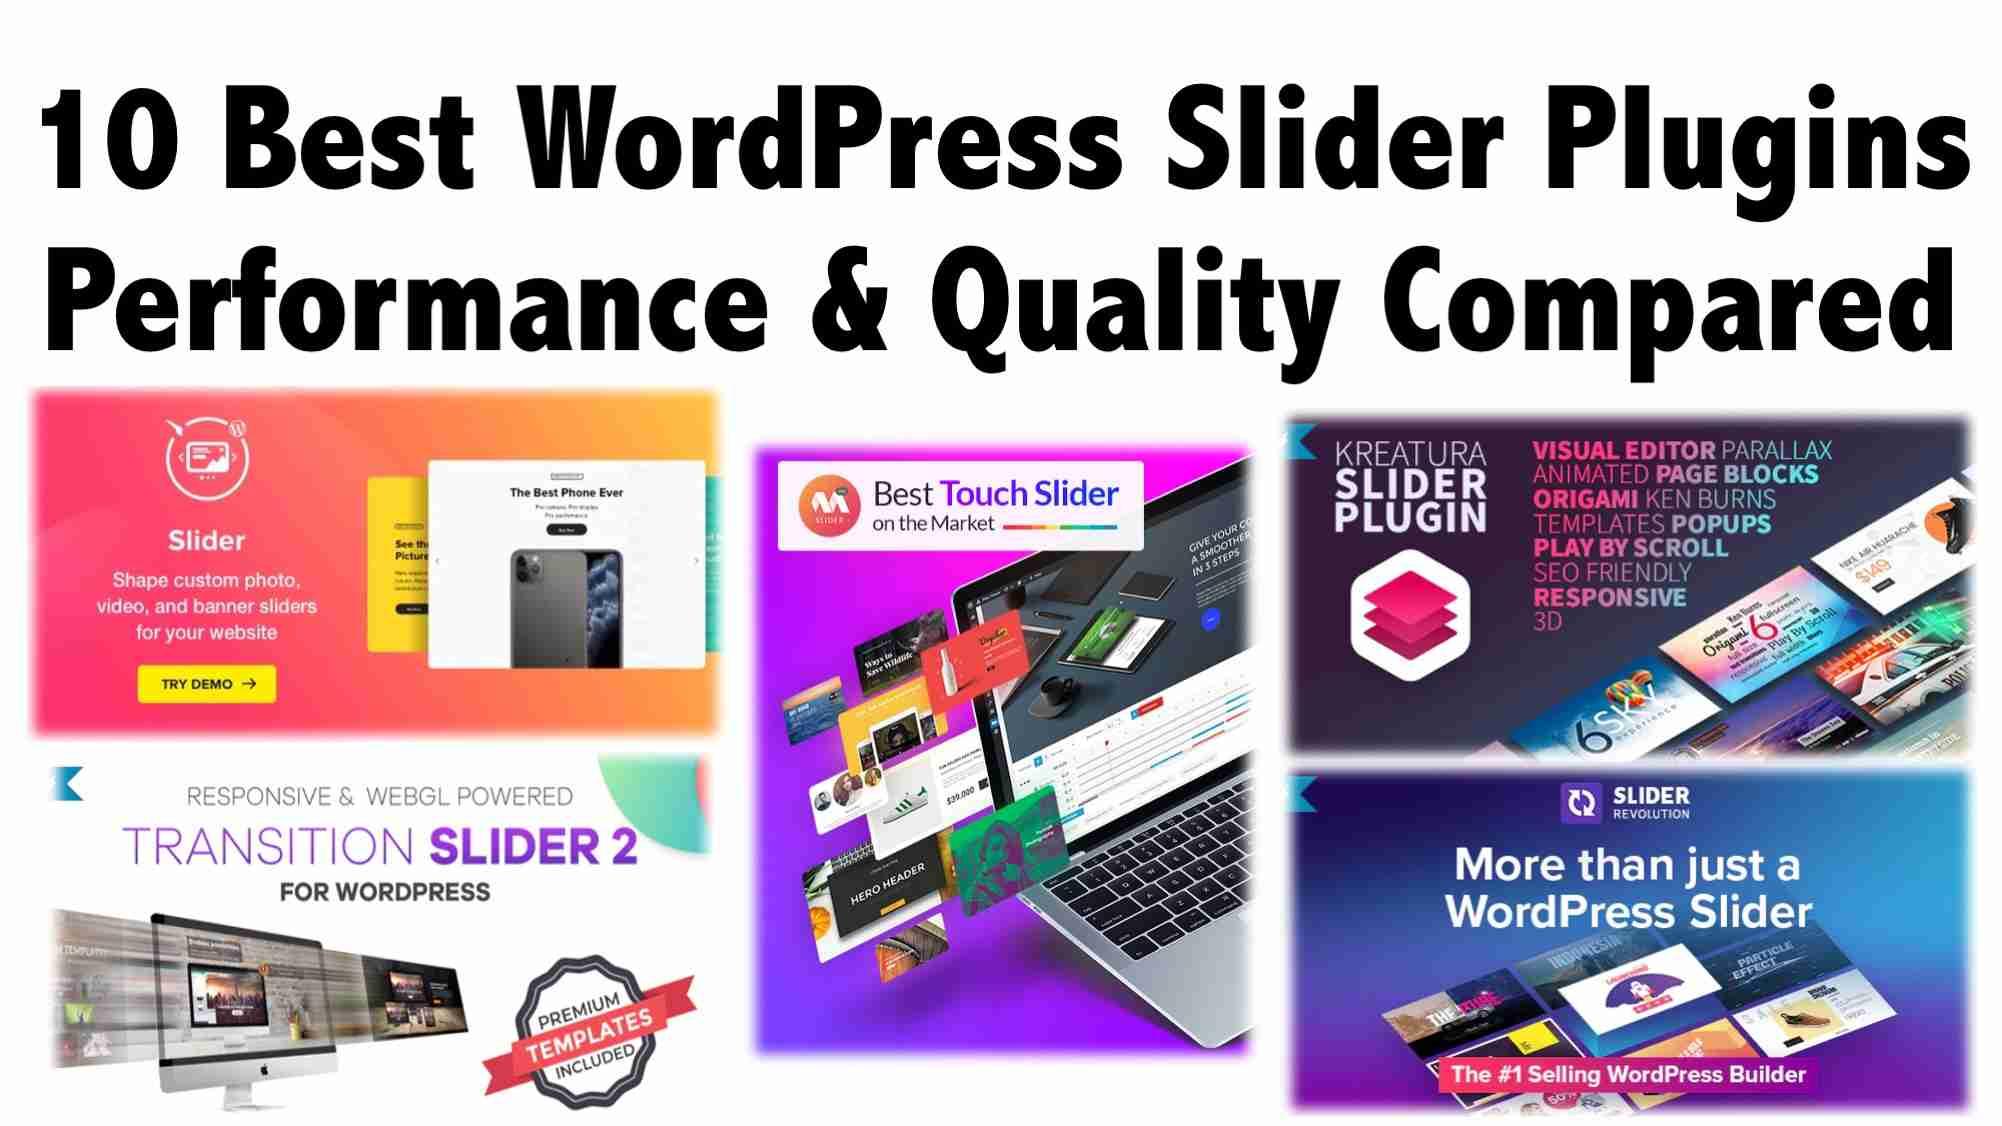 10 Best WordPress Slider Plugins Performance & Quality Compared